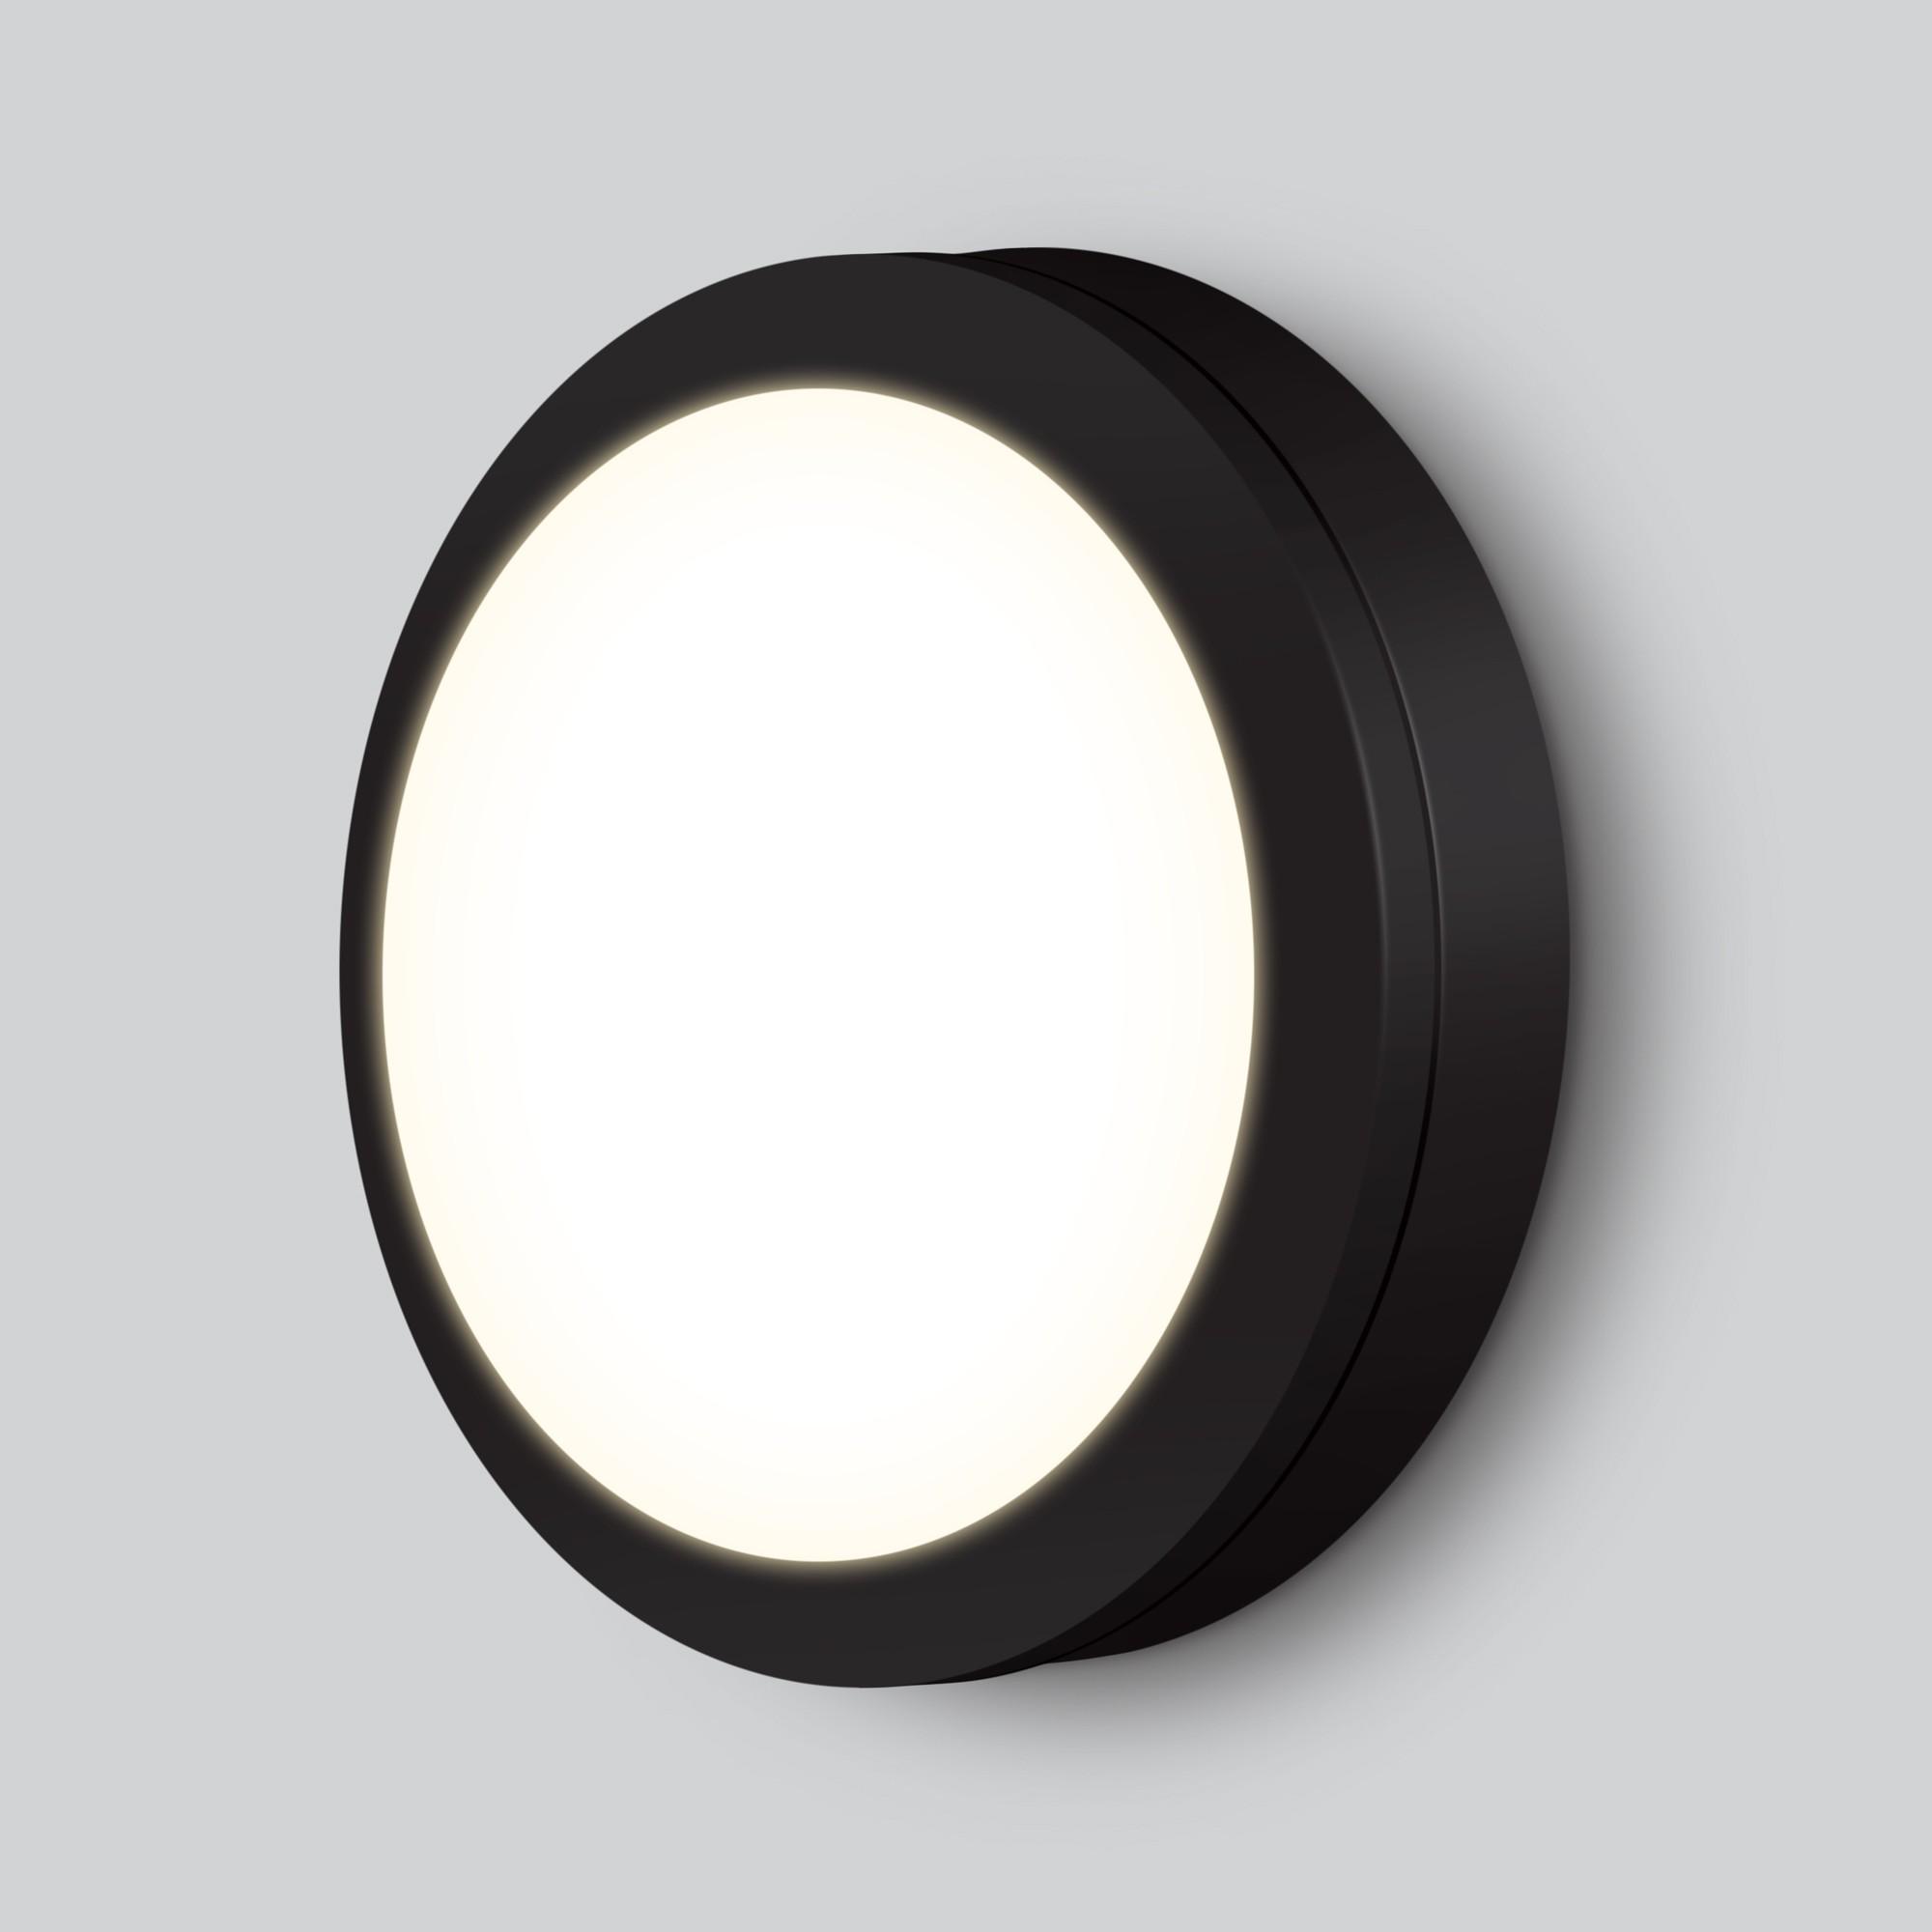 LTB51 LED Светильник 15W 4200K Черный